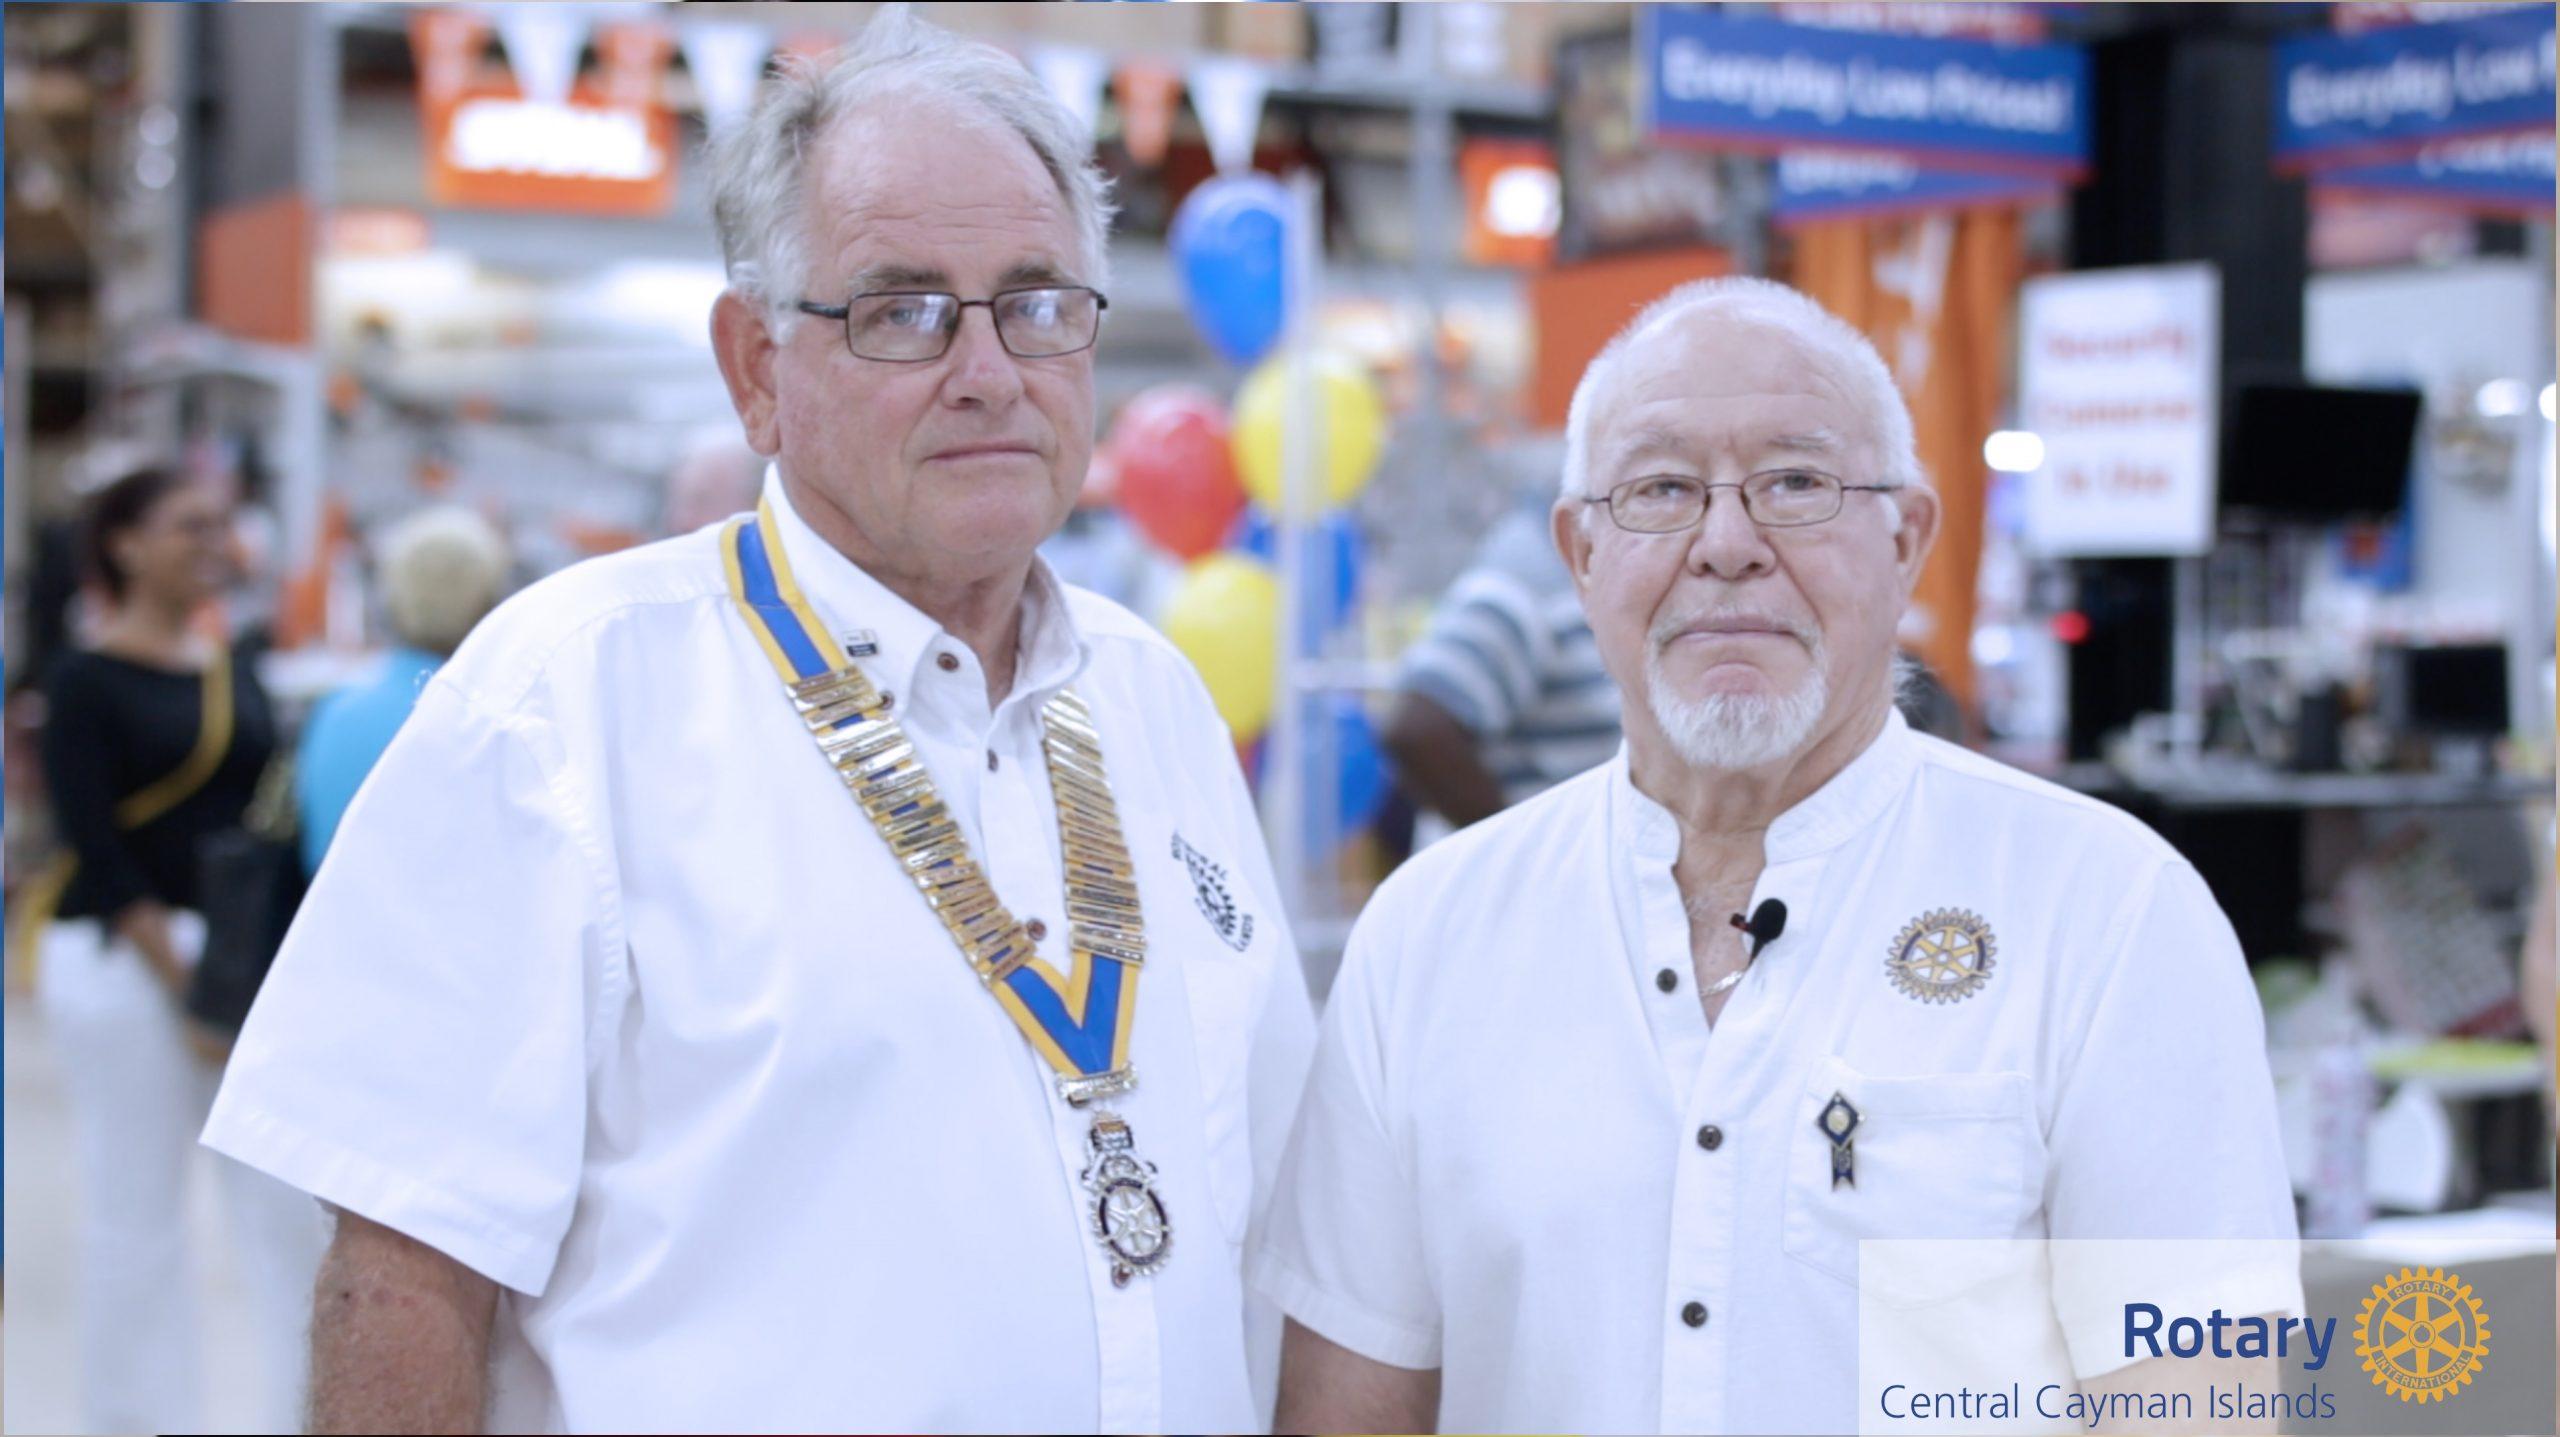 President Colin and Past President John